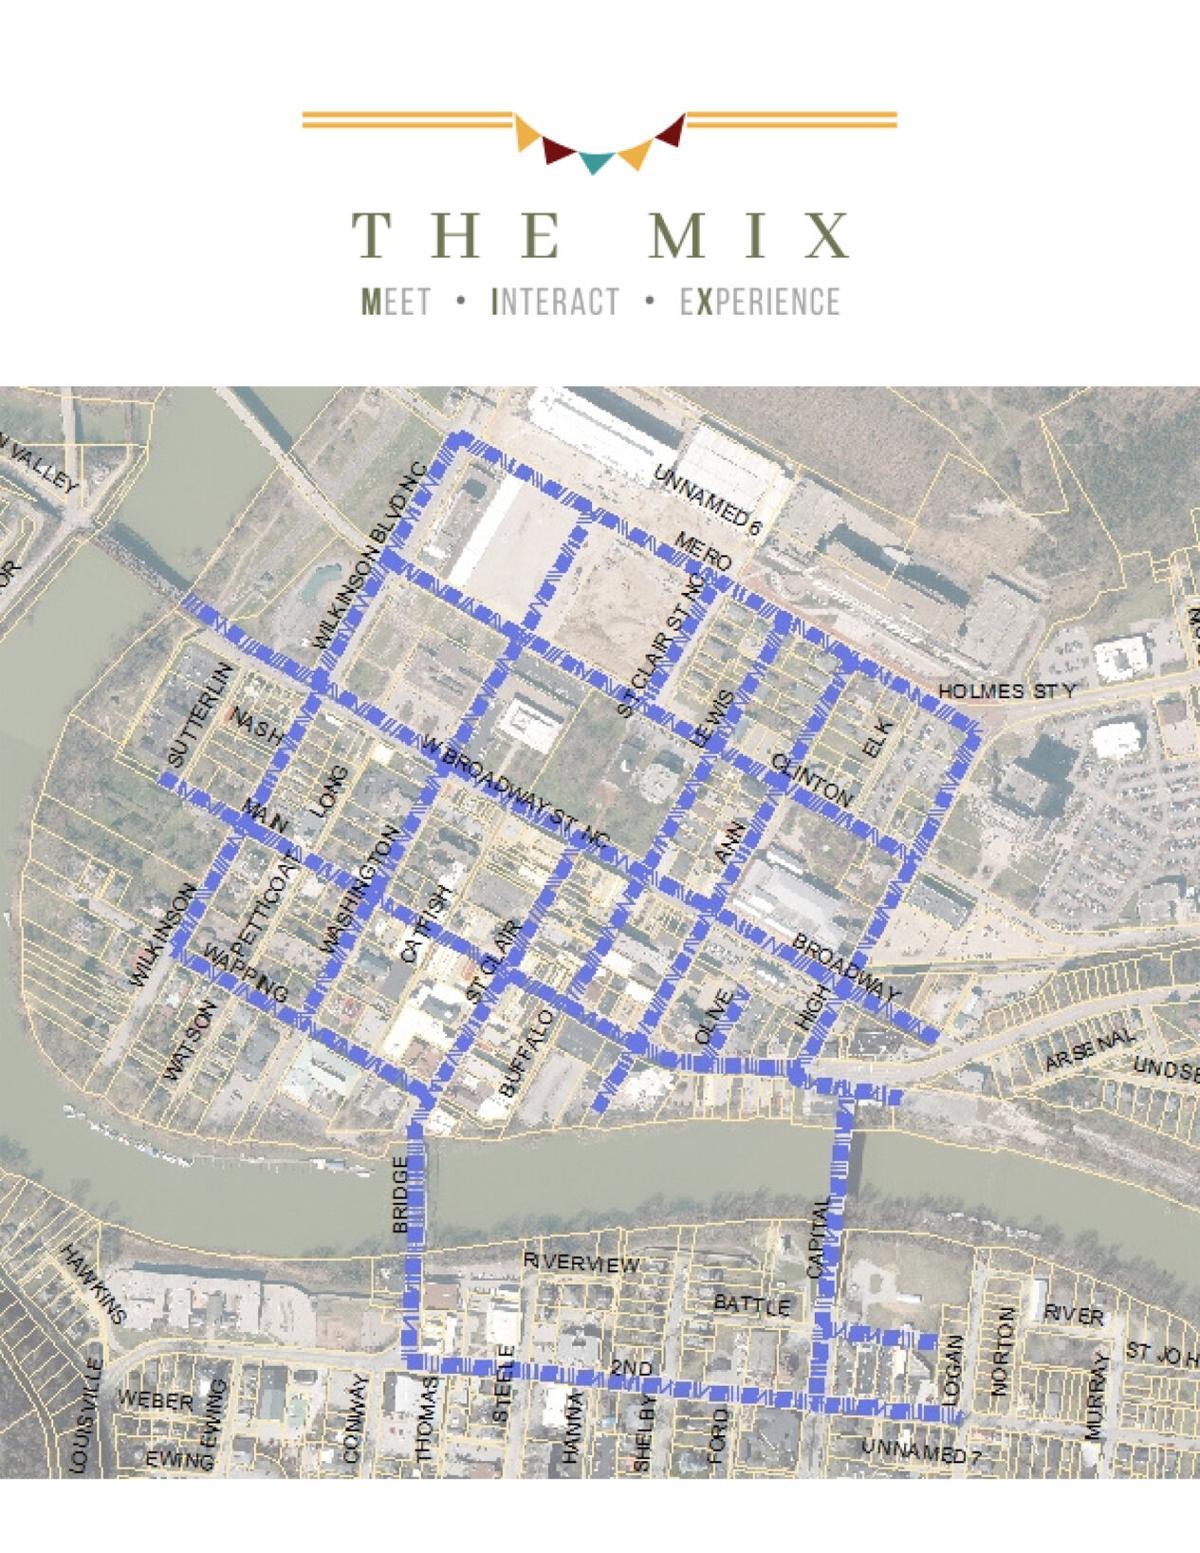 MIX District map